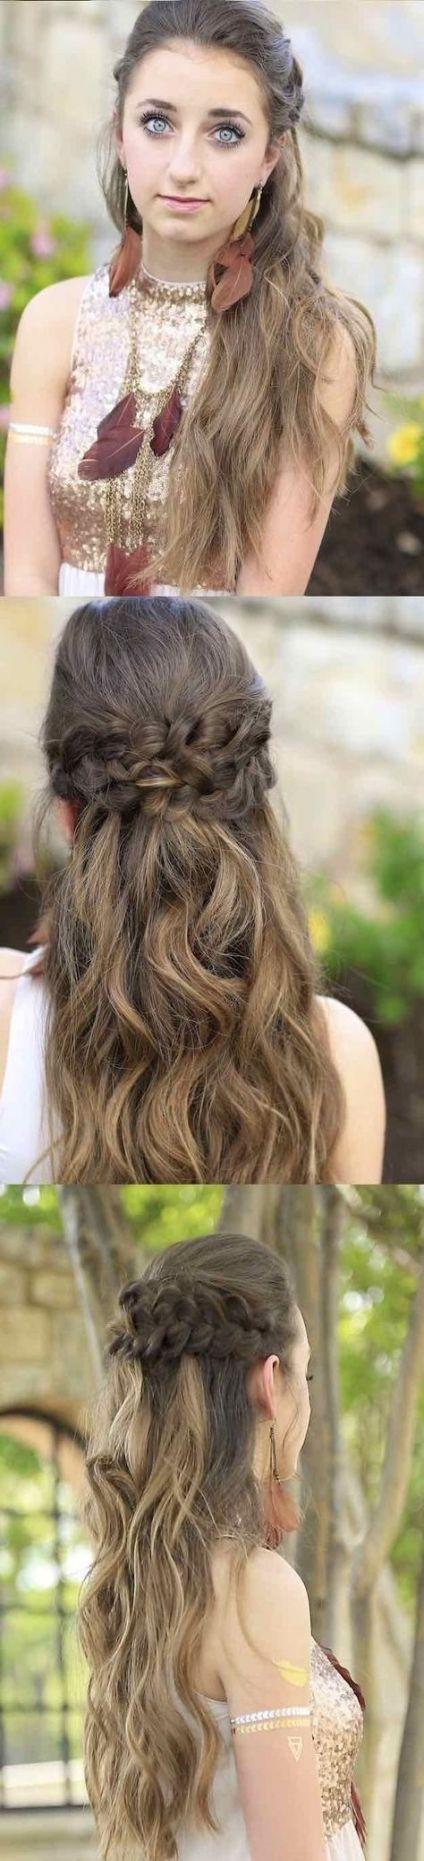 50+ Trendy Hairstyles For Medium Length Hair Tutorial Half ...